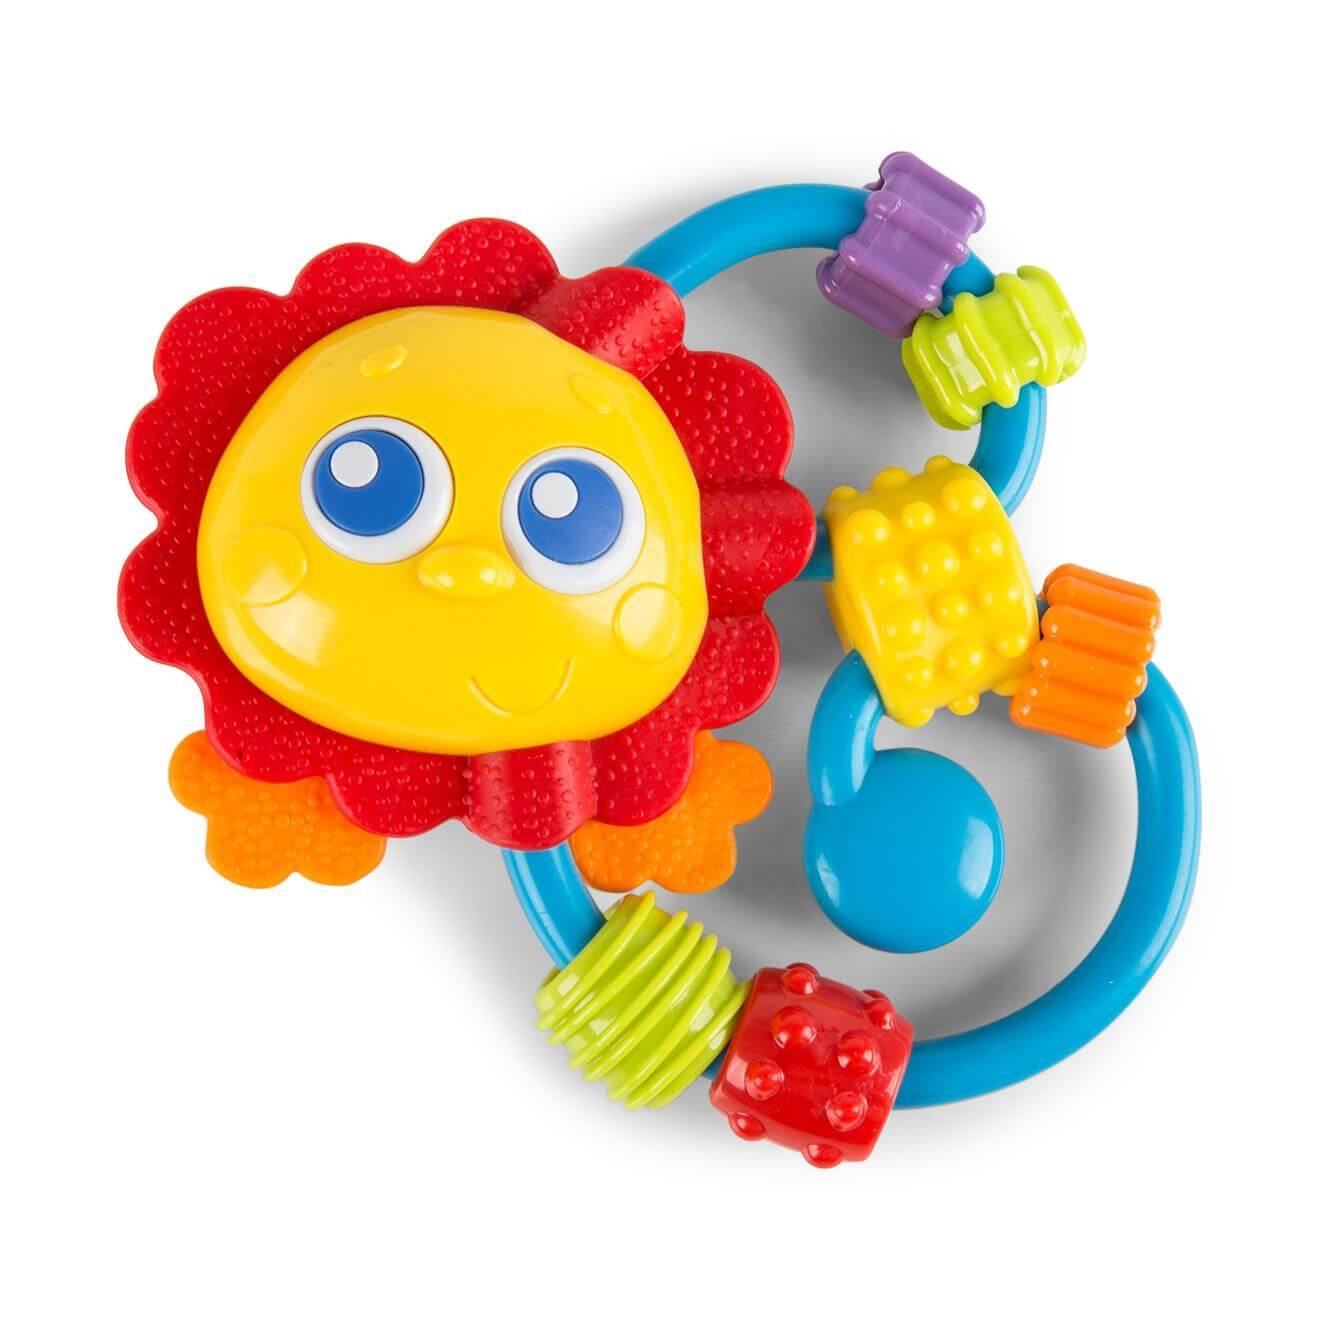 Playgro Curly Critter Παιδική Κουδουνίστρα Λιονταράκι3m+ BPA Free